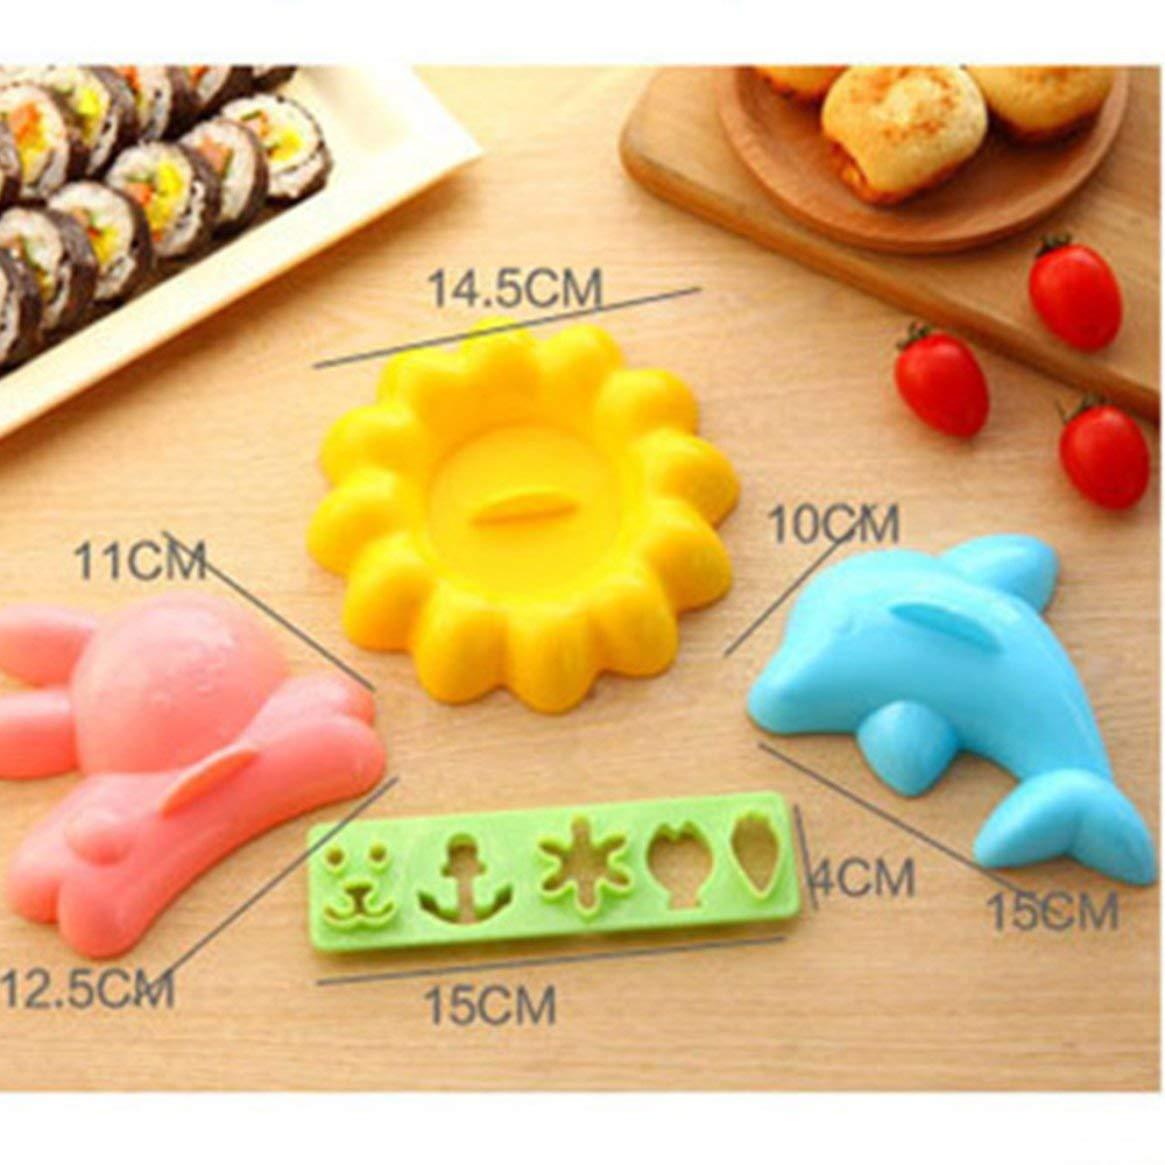 4 teile/satz Schö ne Cartoon DIY Reis Ball Mold Kinder Lebensmittel Cartoon Tier Styling Werkzeuge Kreative Kü che Liefert Frü hstü ck Reisform Delicacydex